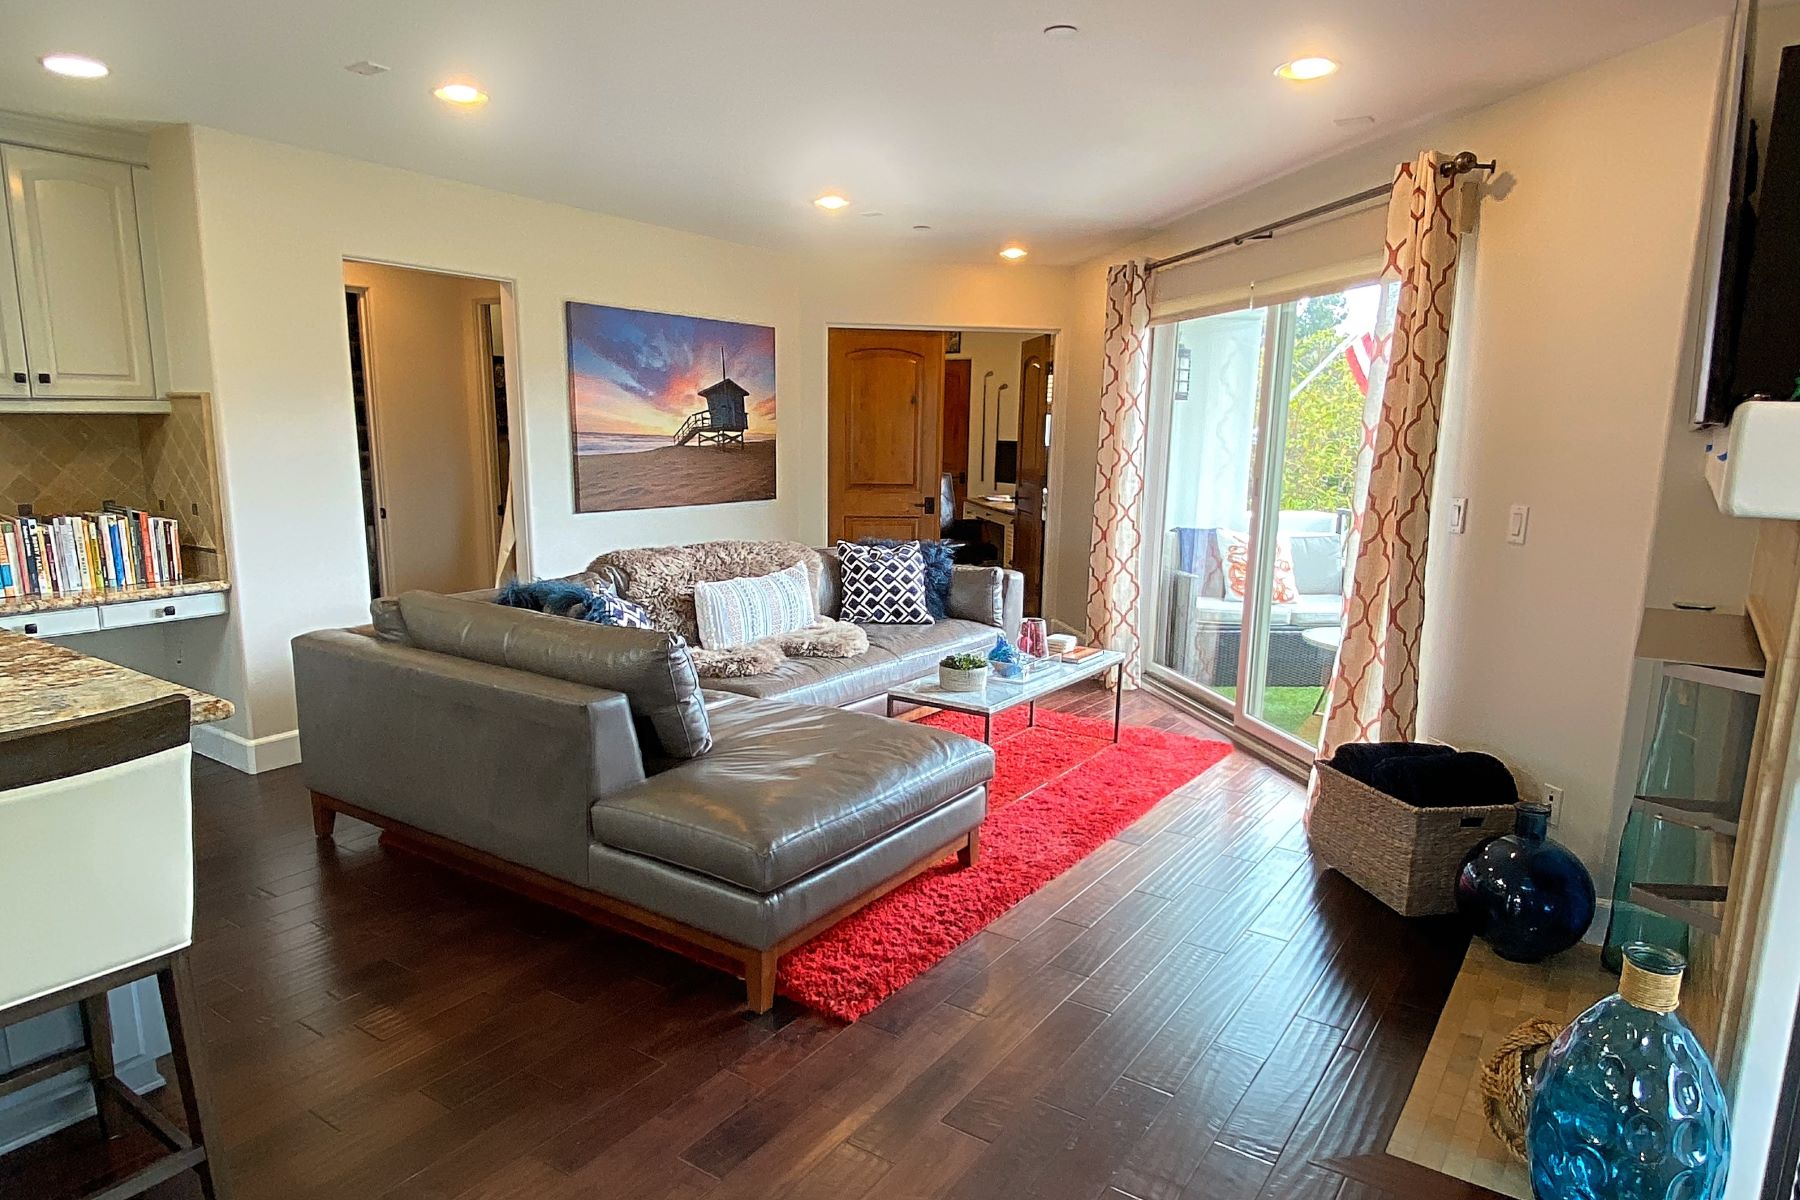 Property for Sale at 1126 Laurel Avenue, Manhattan Beach, CA 90266 Manhattan Beach, California 90266 United States